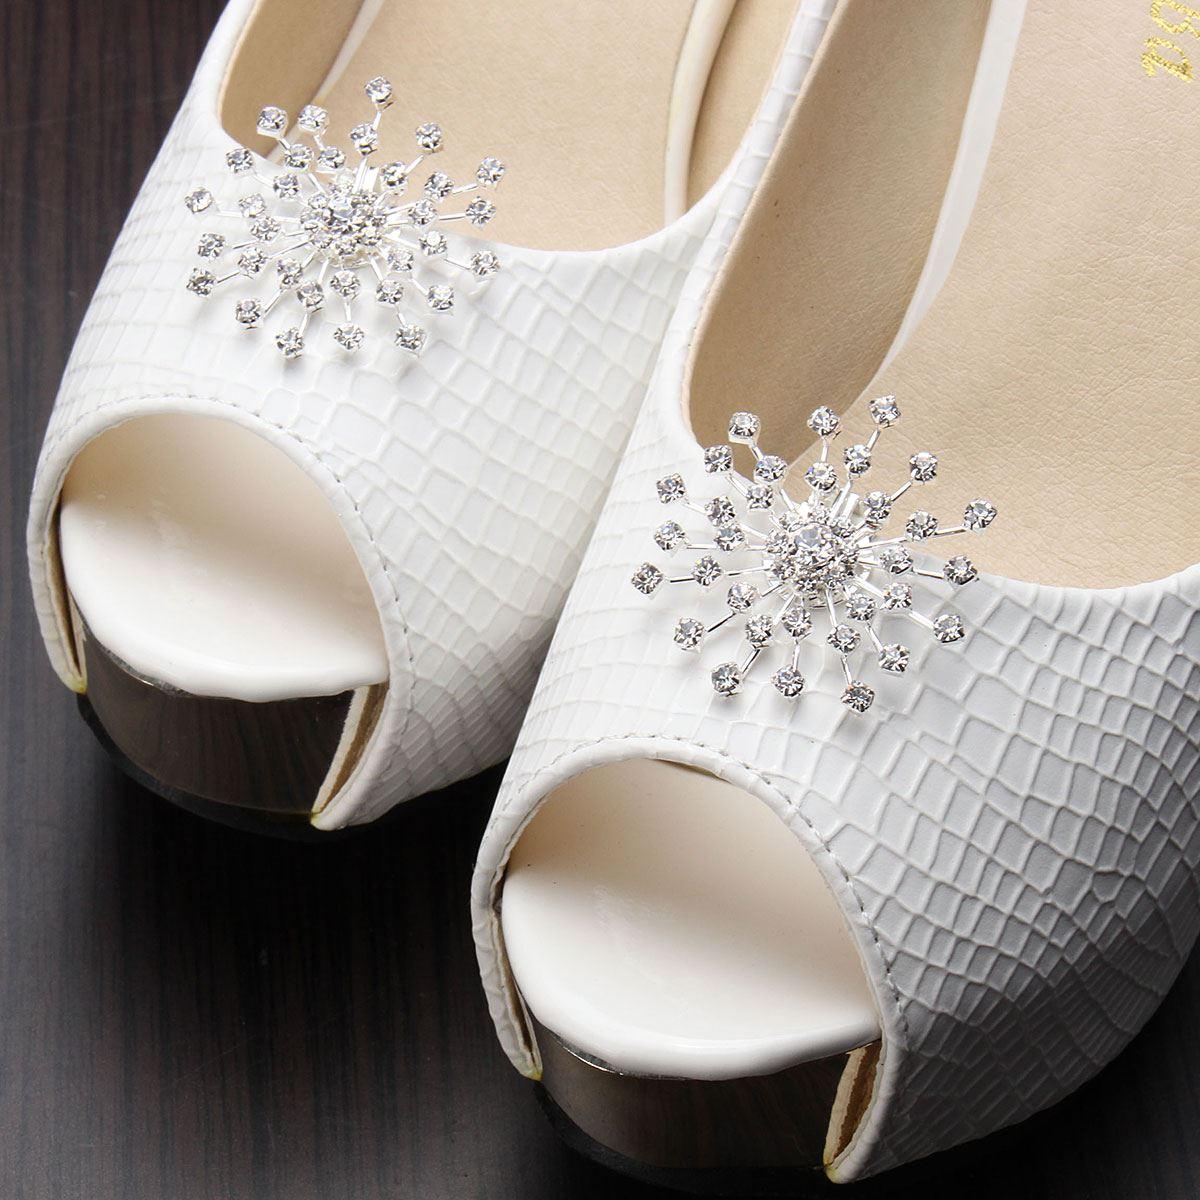 1 Pair High Heel Wedding Shoes Decoration Buckle Clip